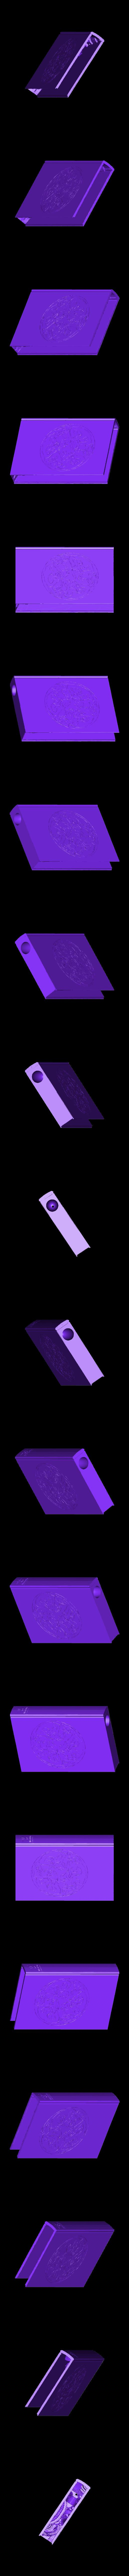 Magic_book_v.2.stl Download free STL file Bookshelf Insert - Magic Book • 3D printable model, FiveNights